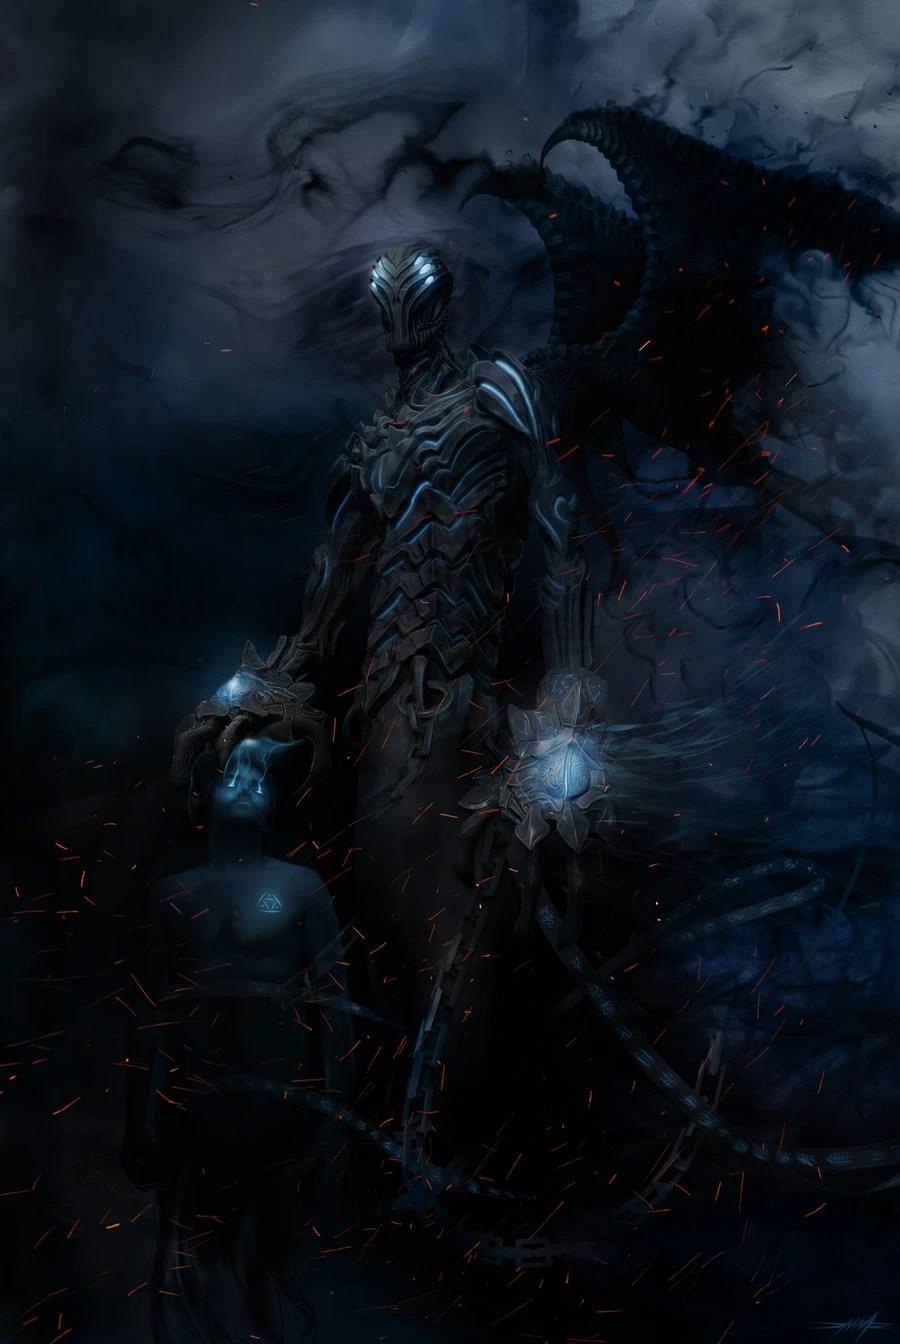 Night King Hd Wallpaper Erebus The Demonic Paradise Wiki Fandom Powered By Wikia